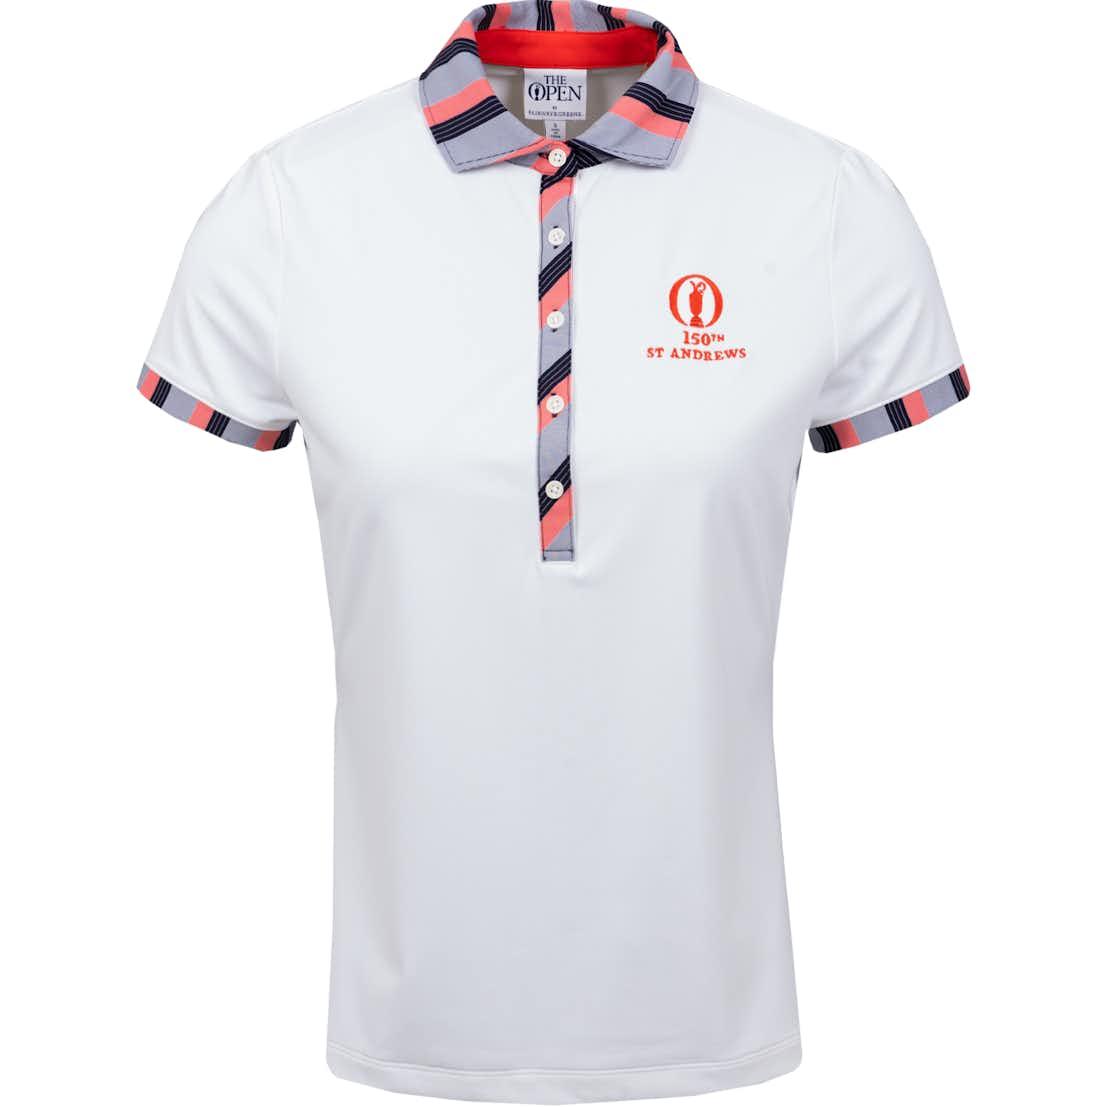 150th St Andrews Plain Polo Shirt - White